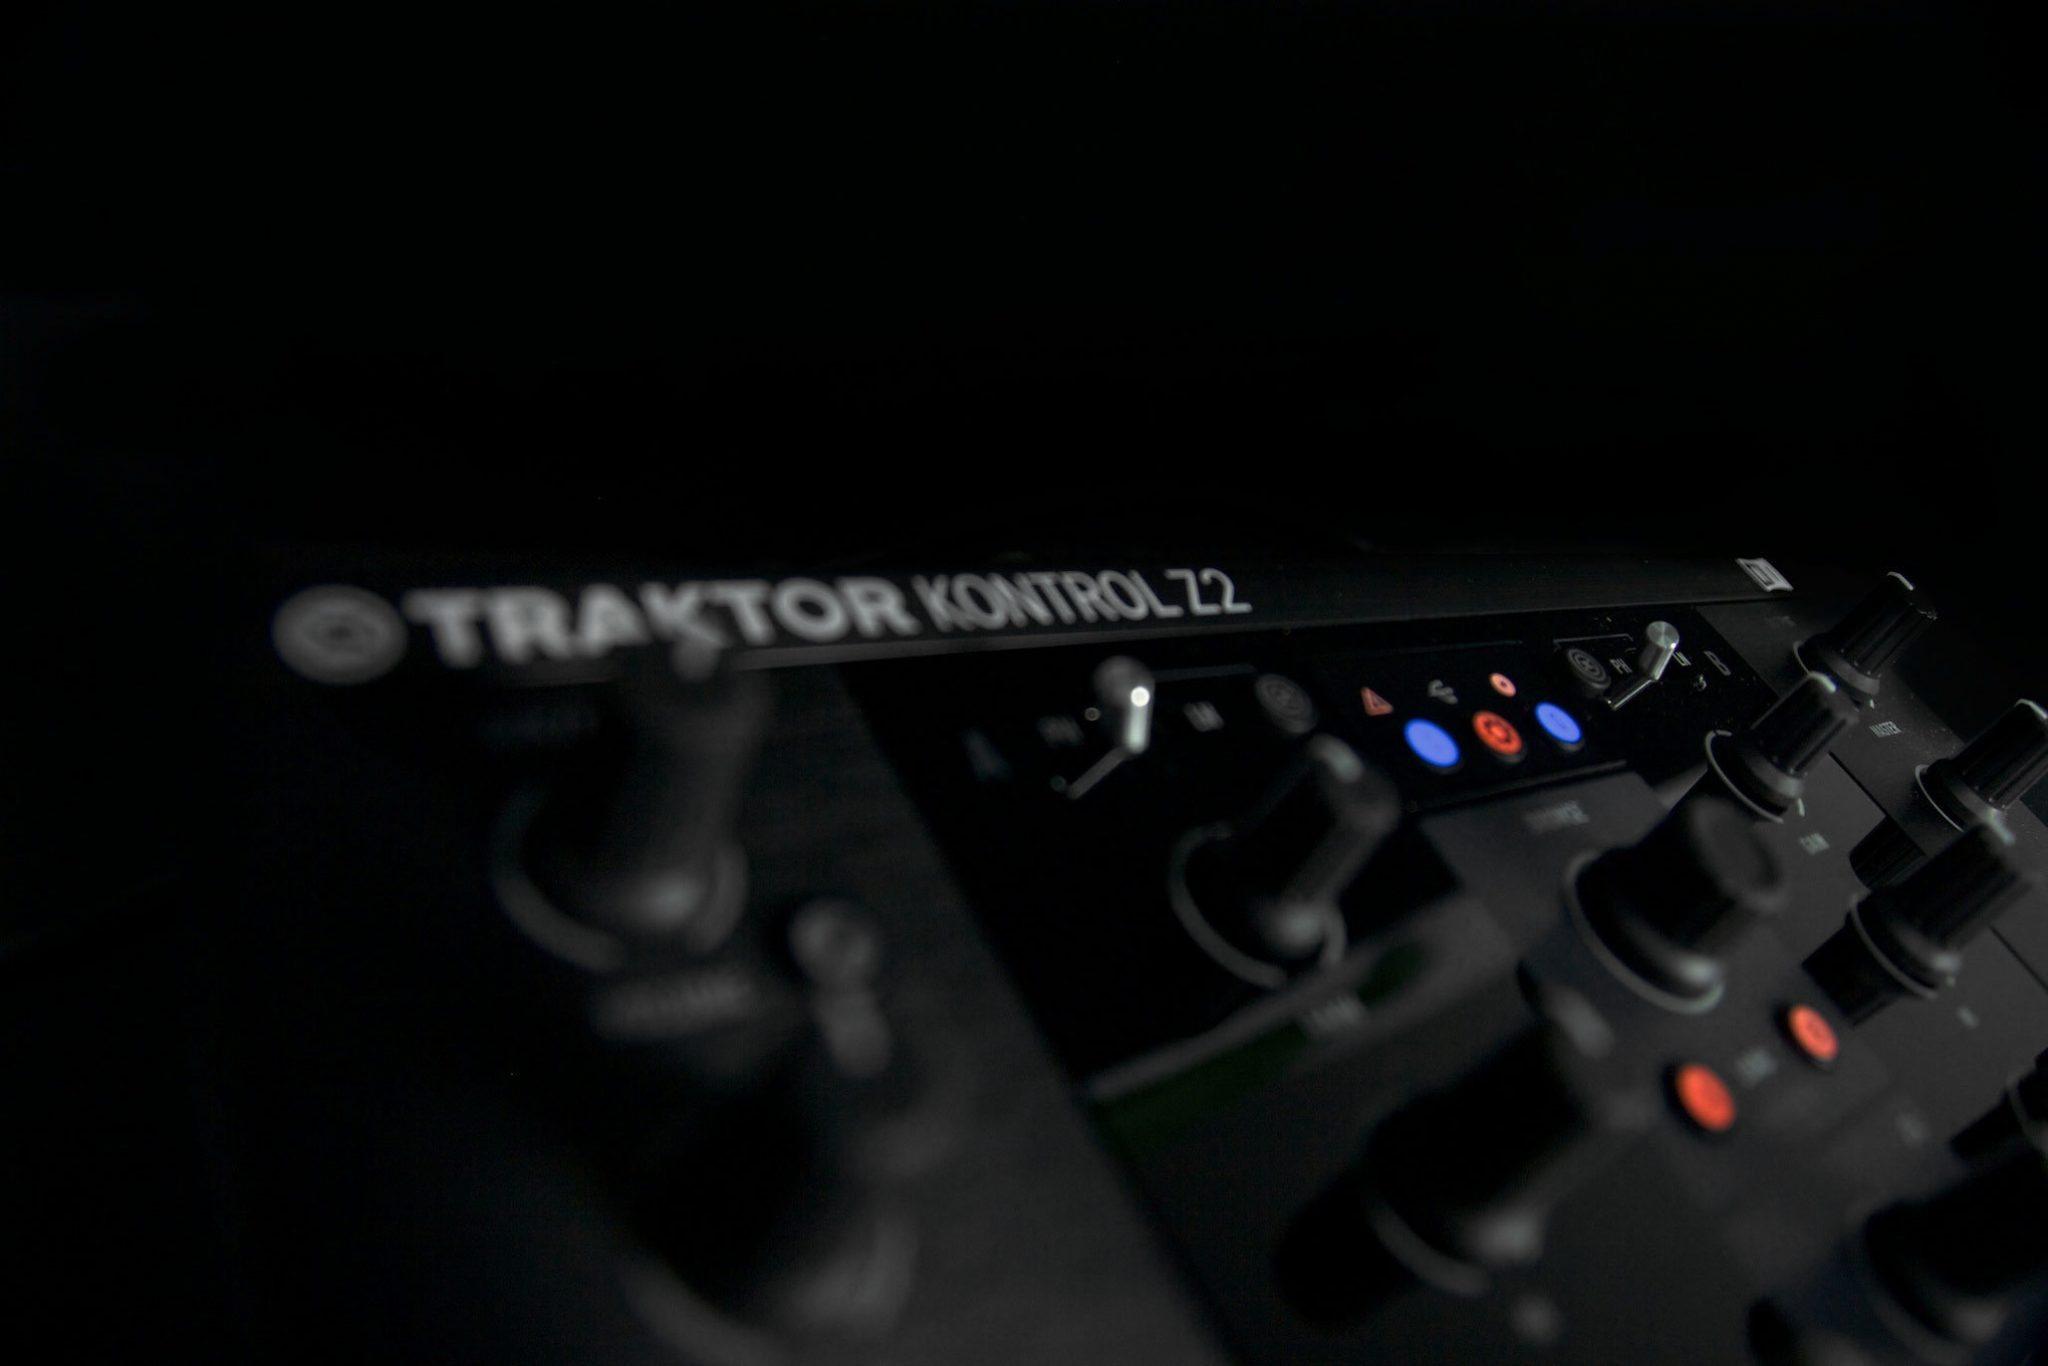 REVIEW: Native Instruments Traktor Kontrol Z2 Part 1 | DJWORX